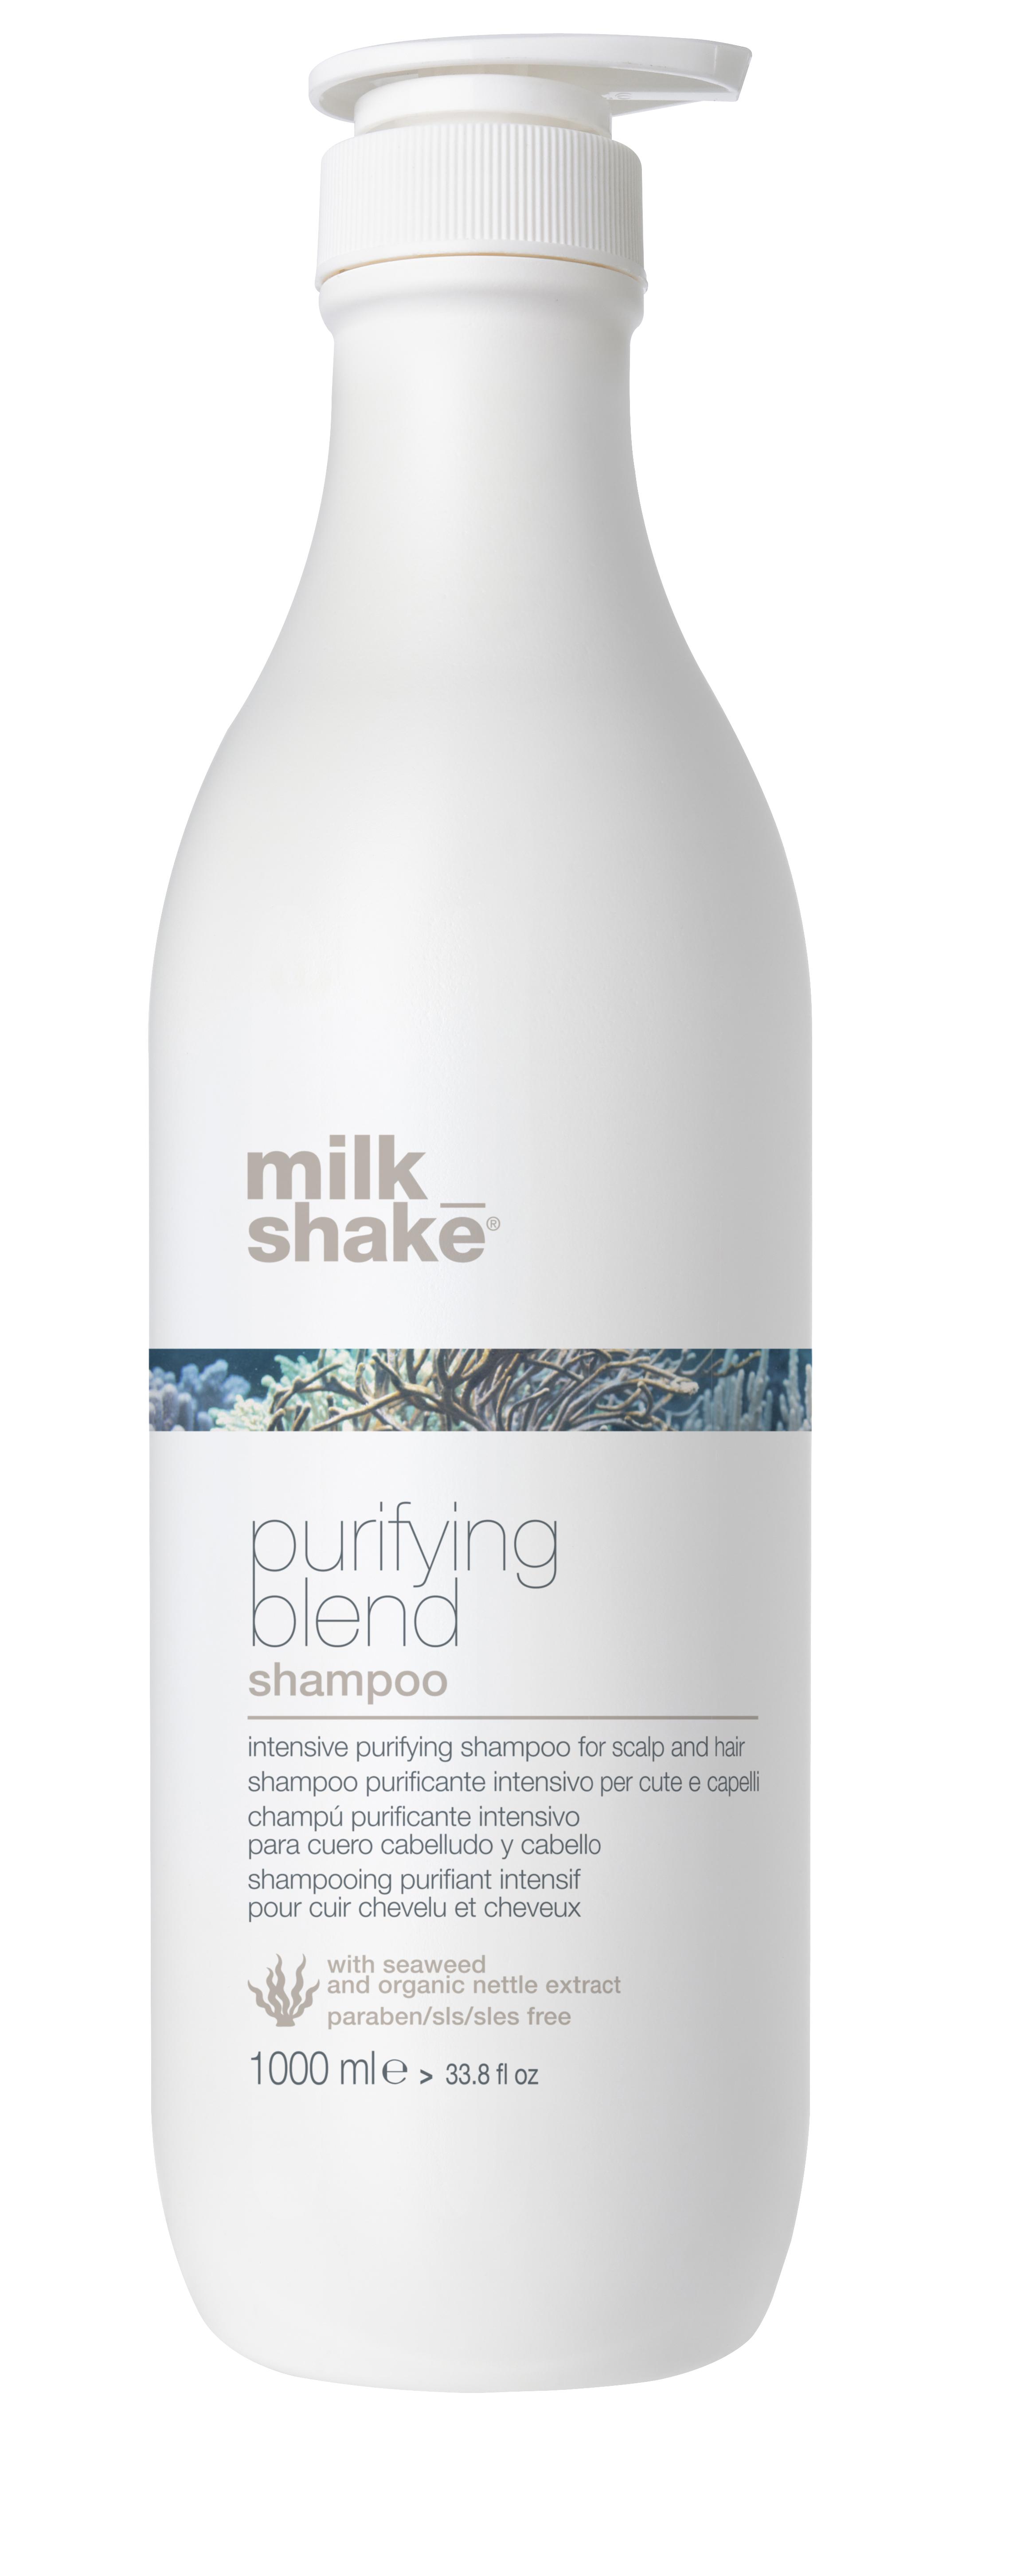 milk_shake - Purifying Blend Shampoo 1000 ml